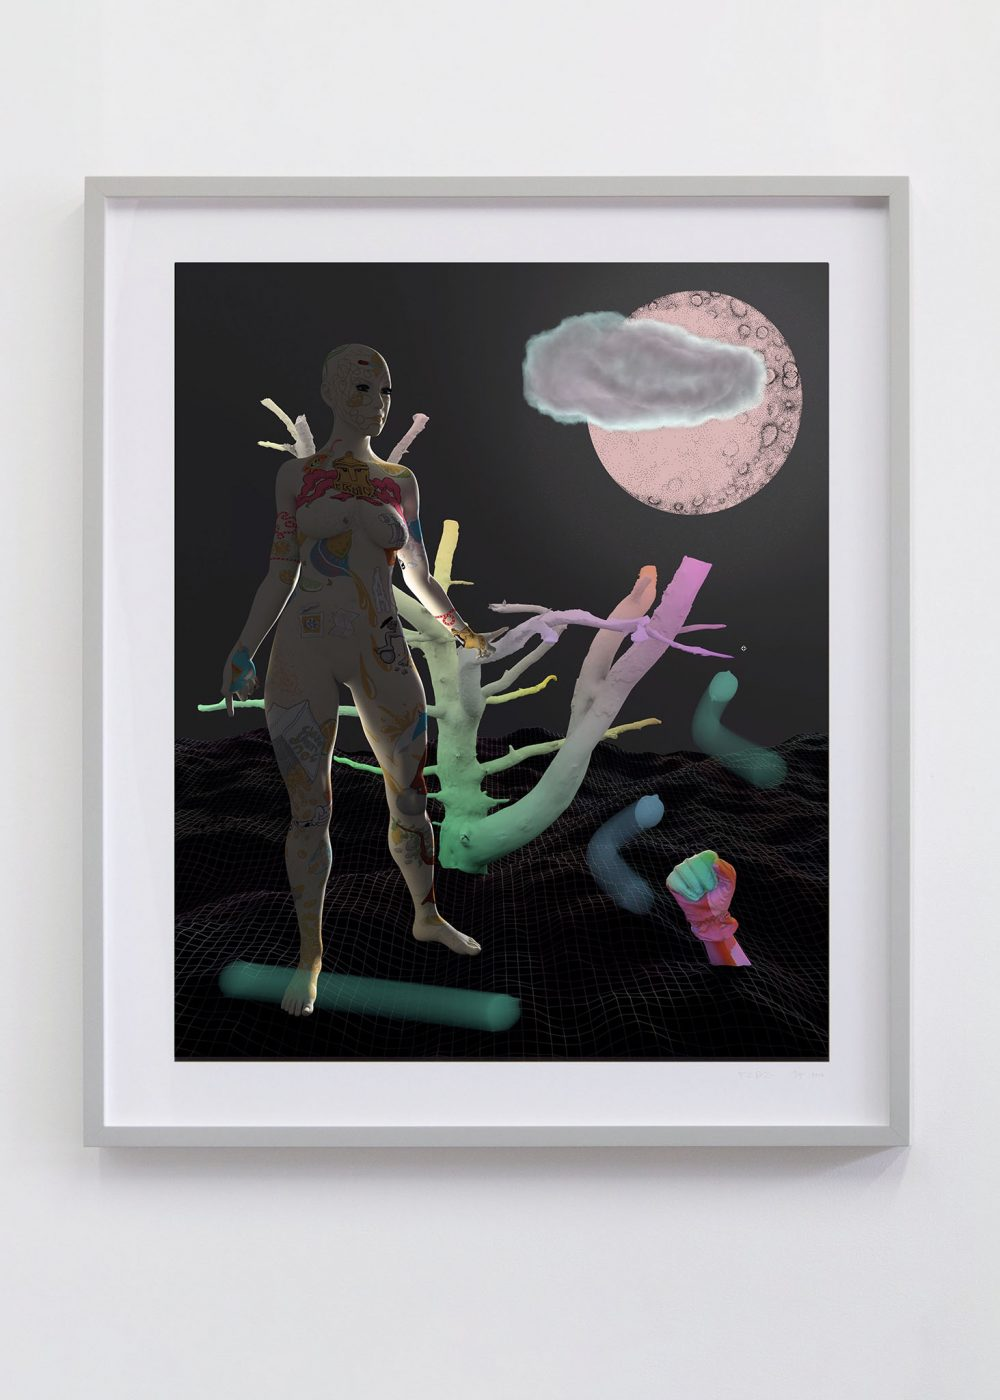 Tim Berresheim - Aspettetori - Galerie - Falko Alexander gallery